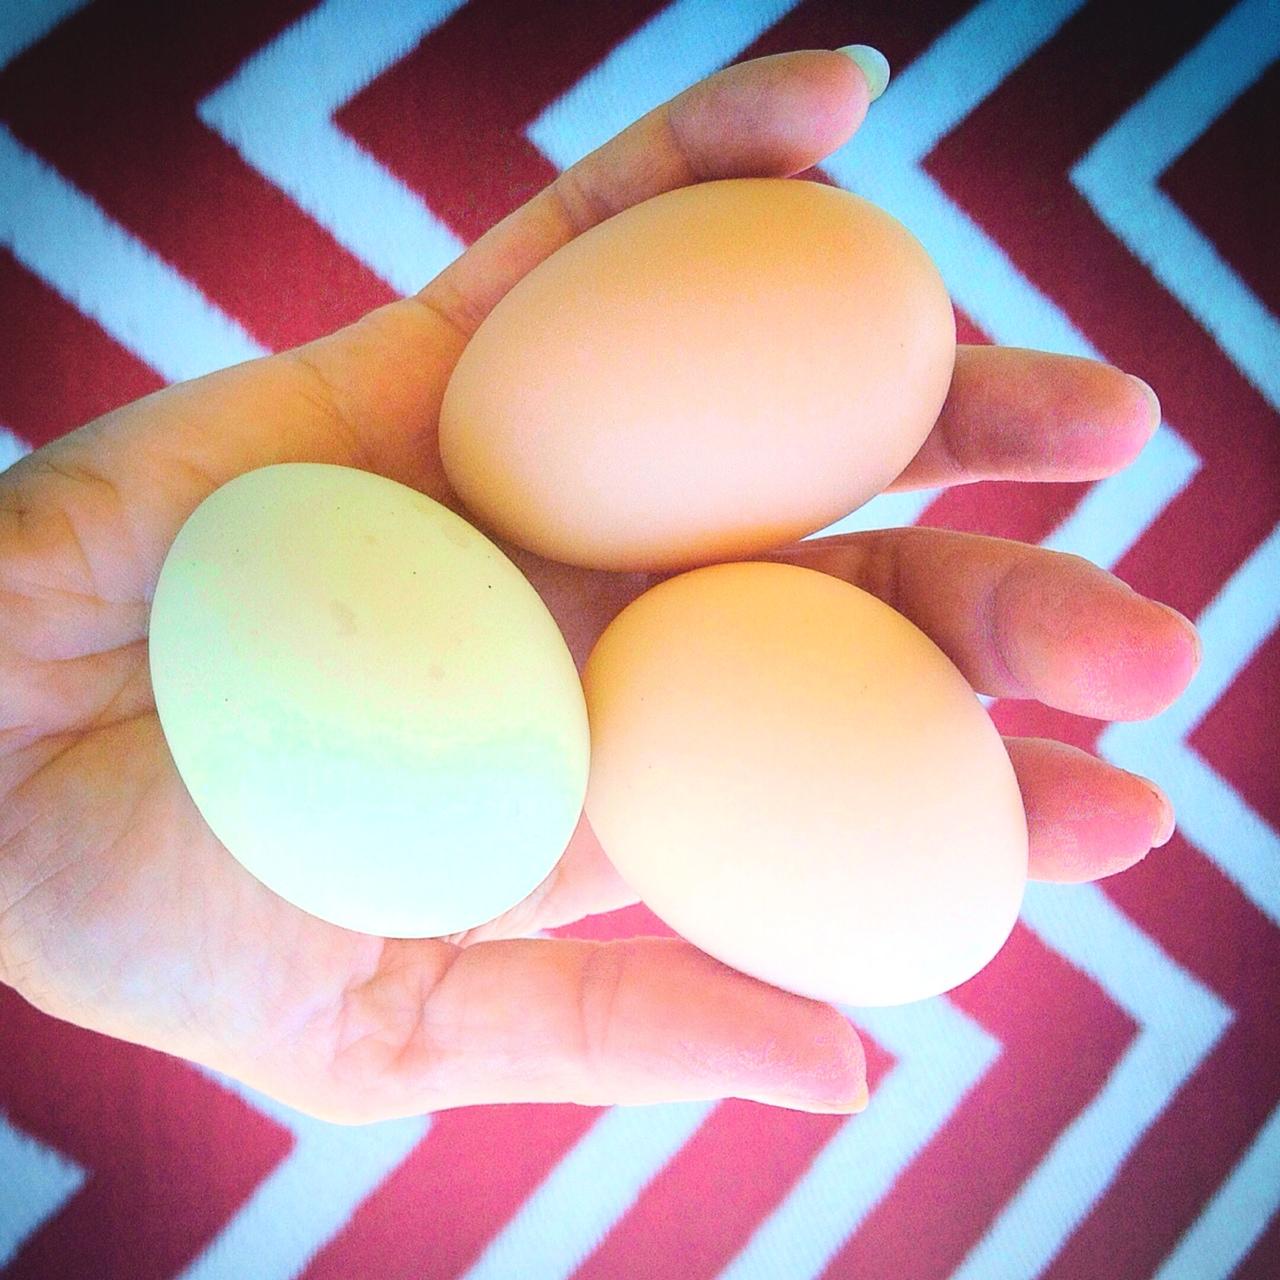 Pastured-Rogue-Eggs.JPG